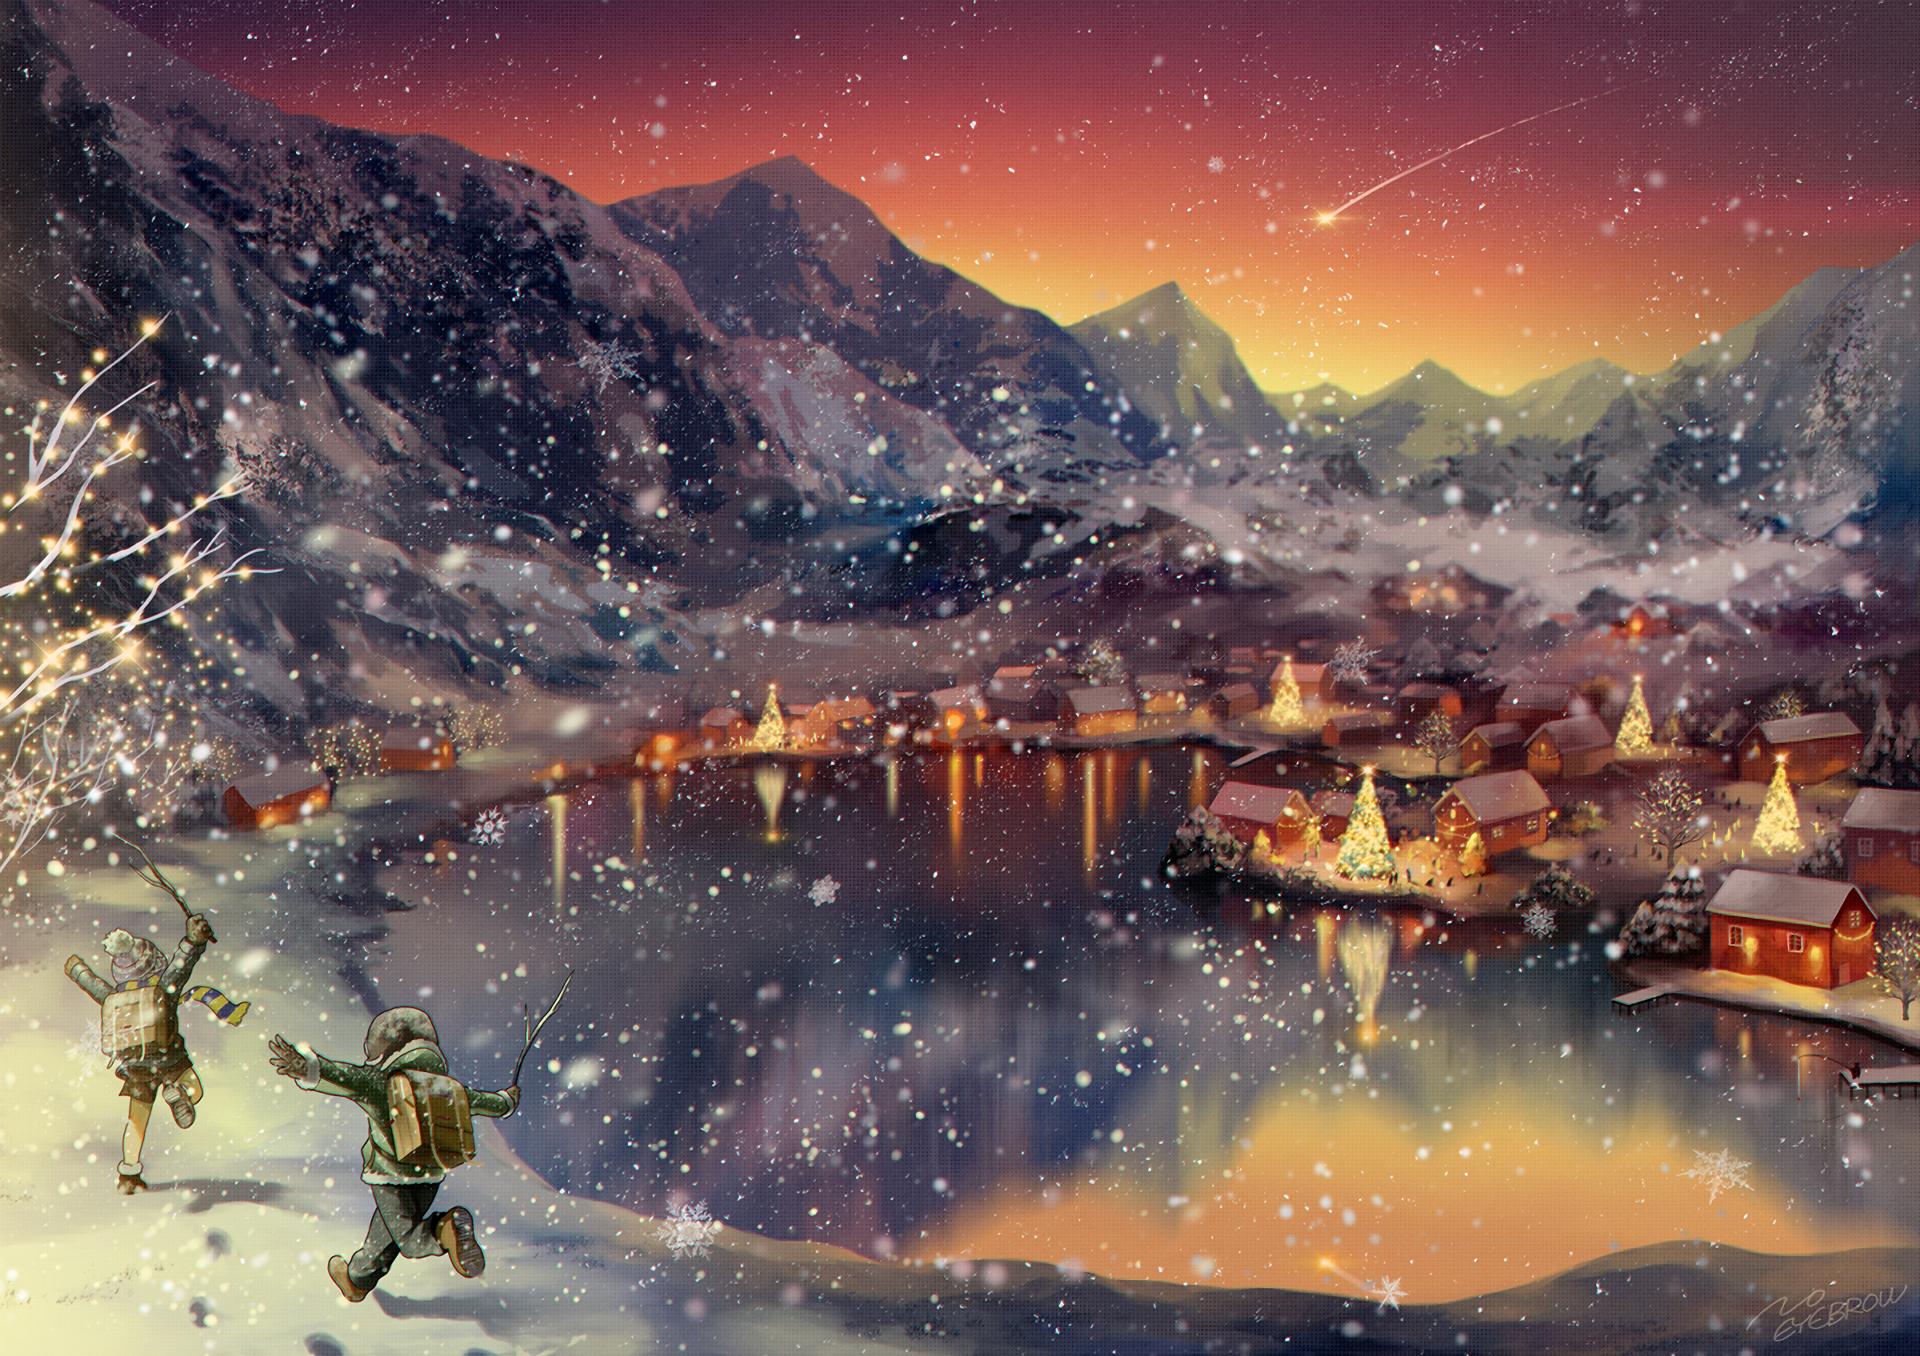 Anime 1920x1356 anime artwork winter mountains landscape lake sunset Christmas